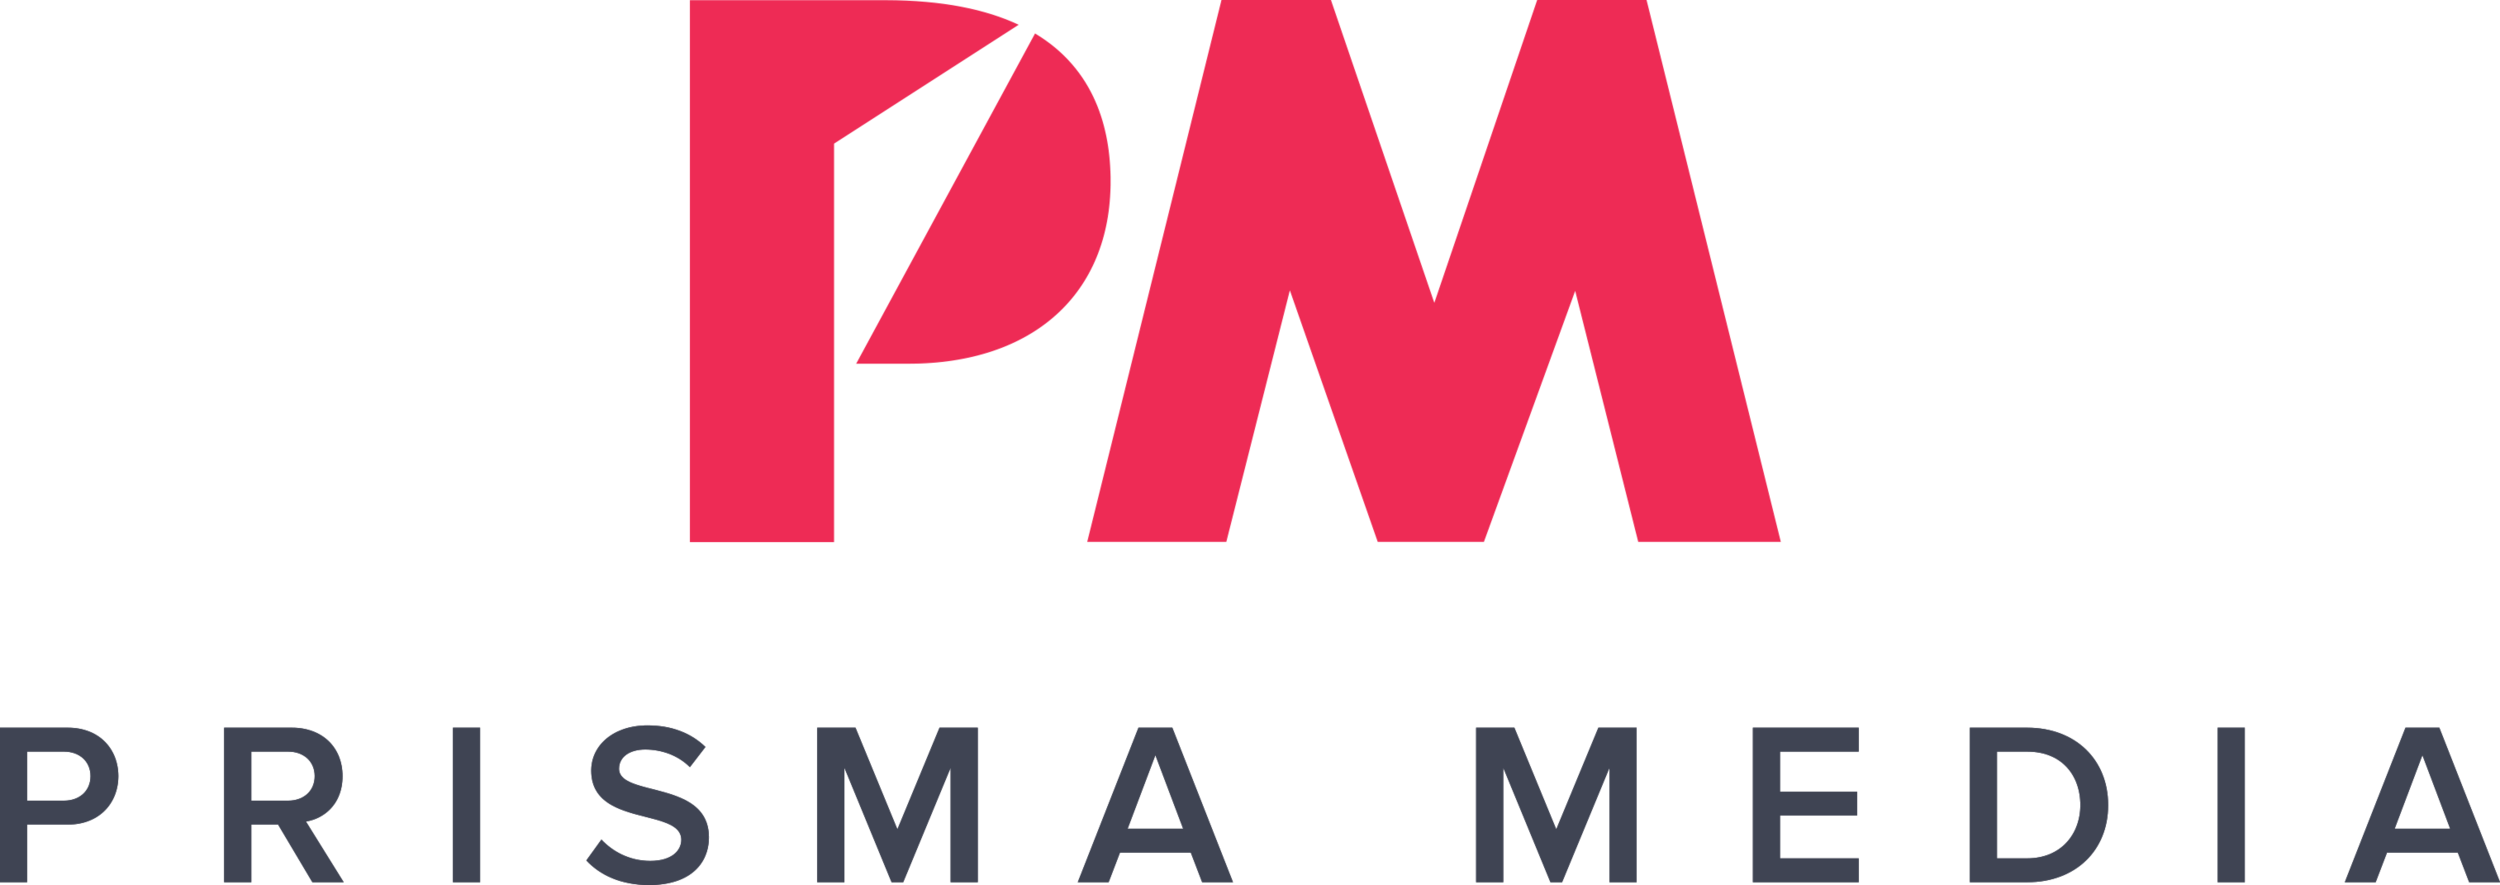 logo_prisma_v1.png